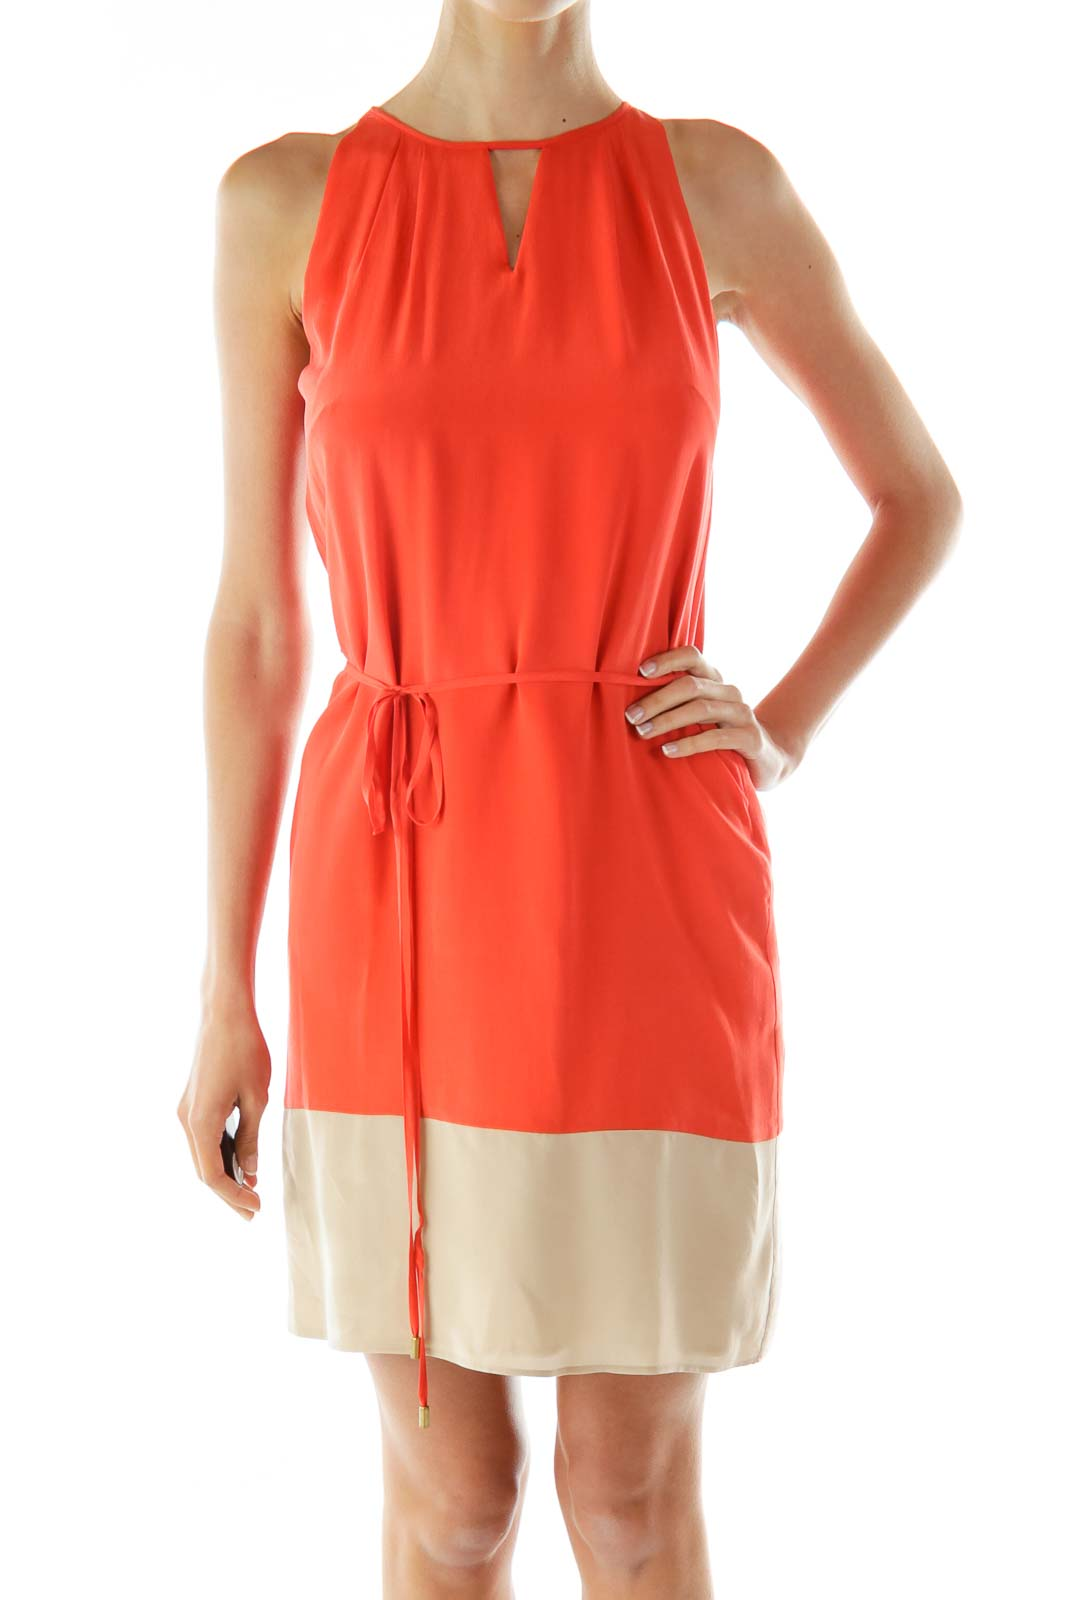 Orange Beige Color Block Day Dress Front